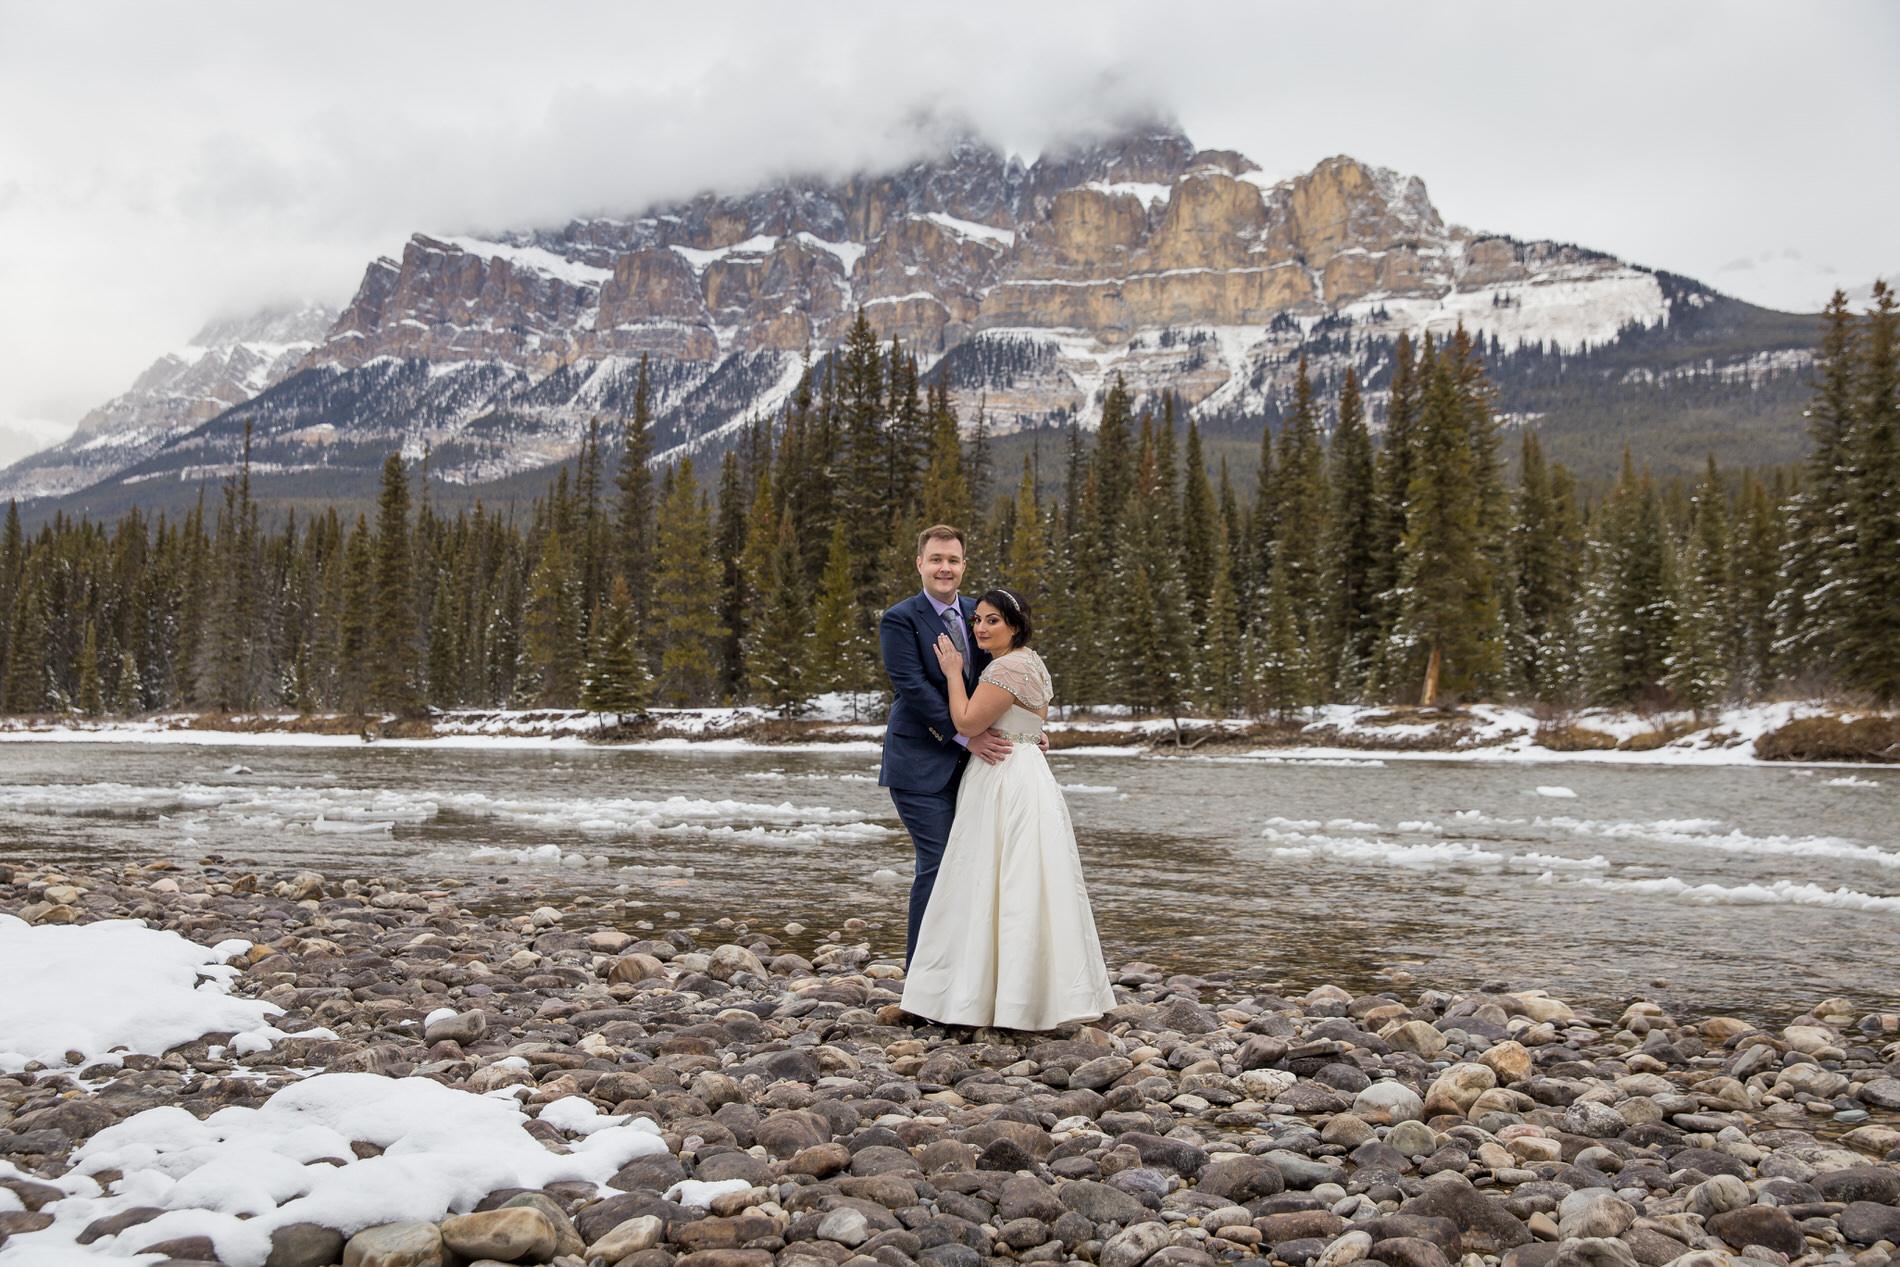 Sari and Greg Wedding-017.jpg